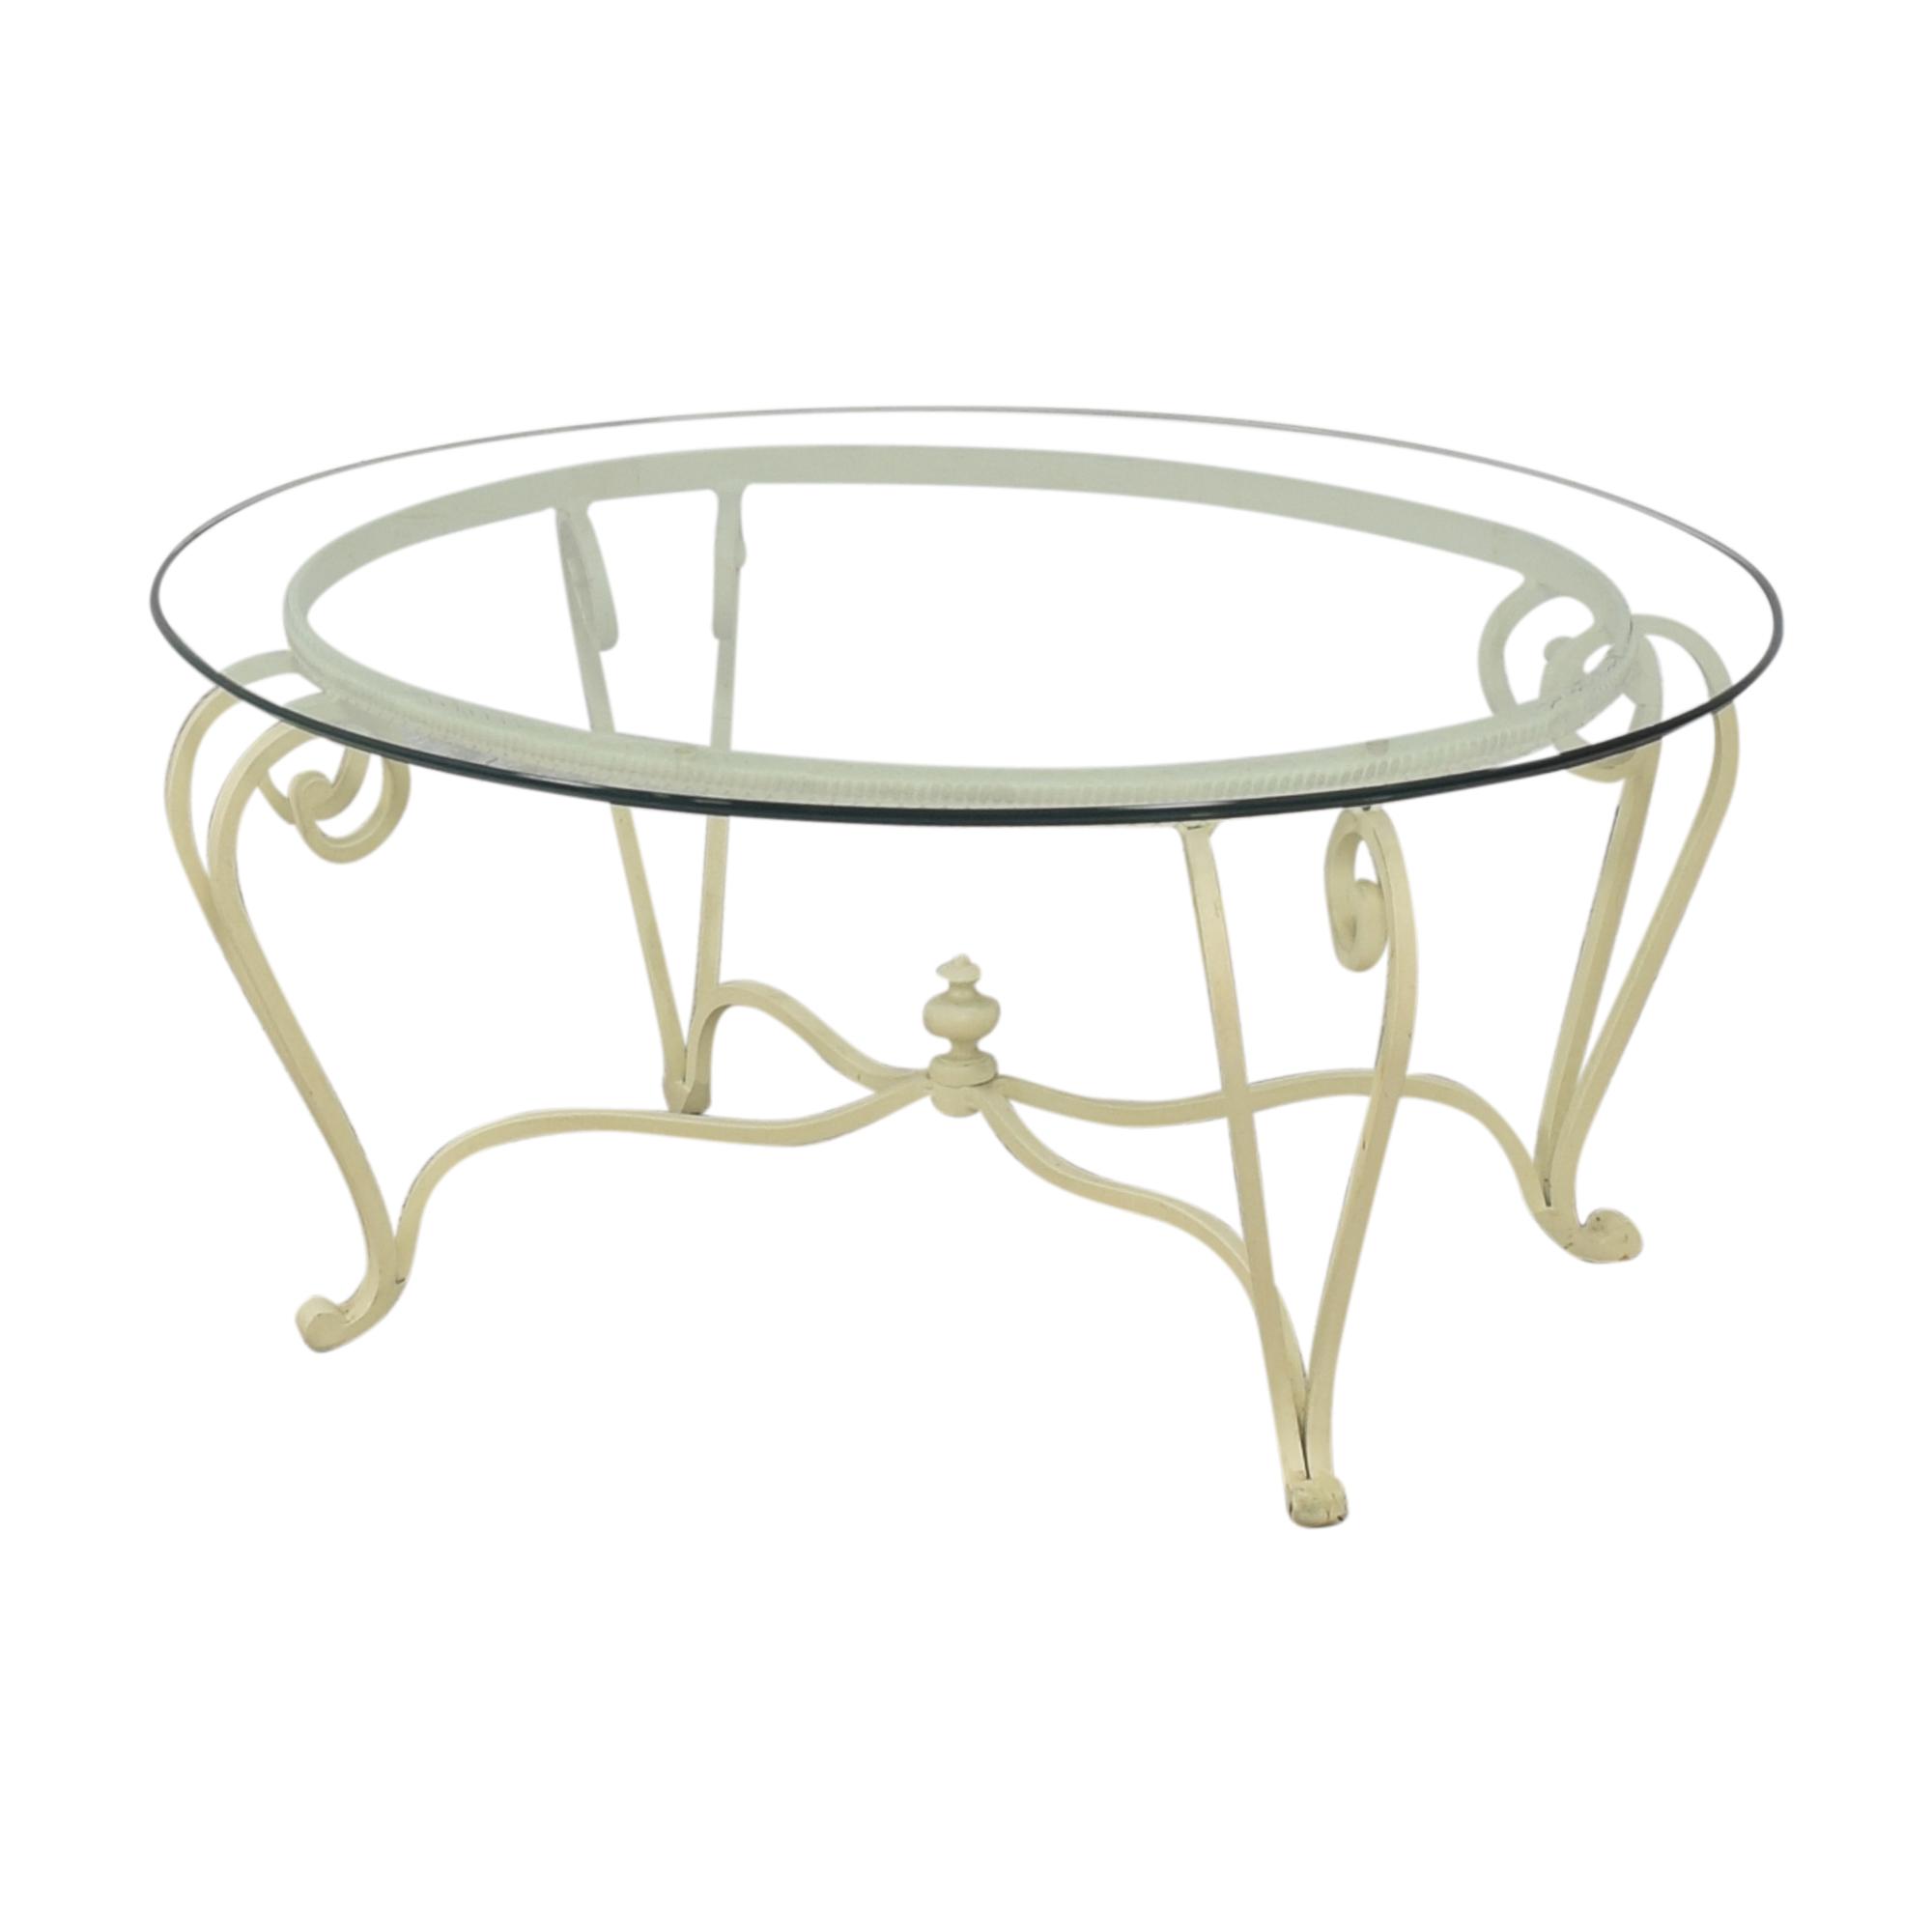 Ethan Allen Ethan Allen Oval Coffee Table discount